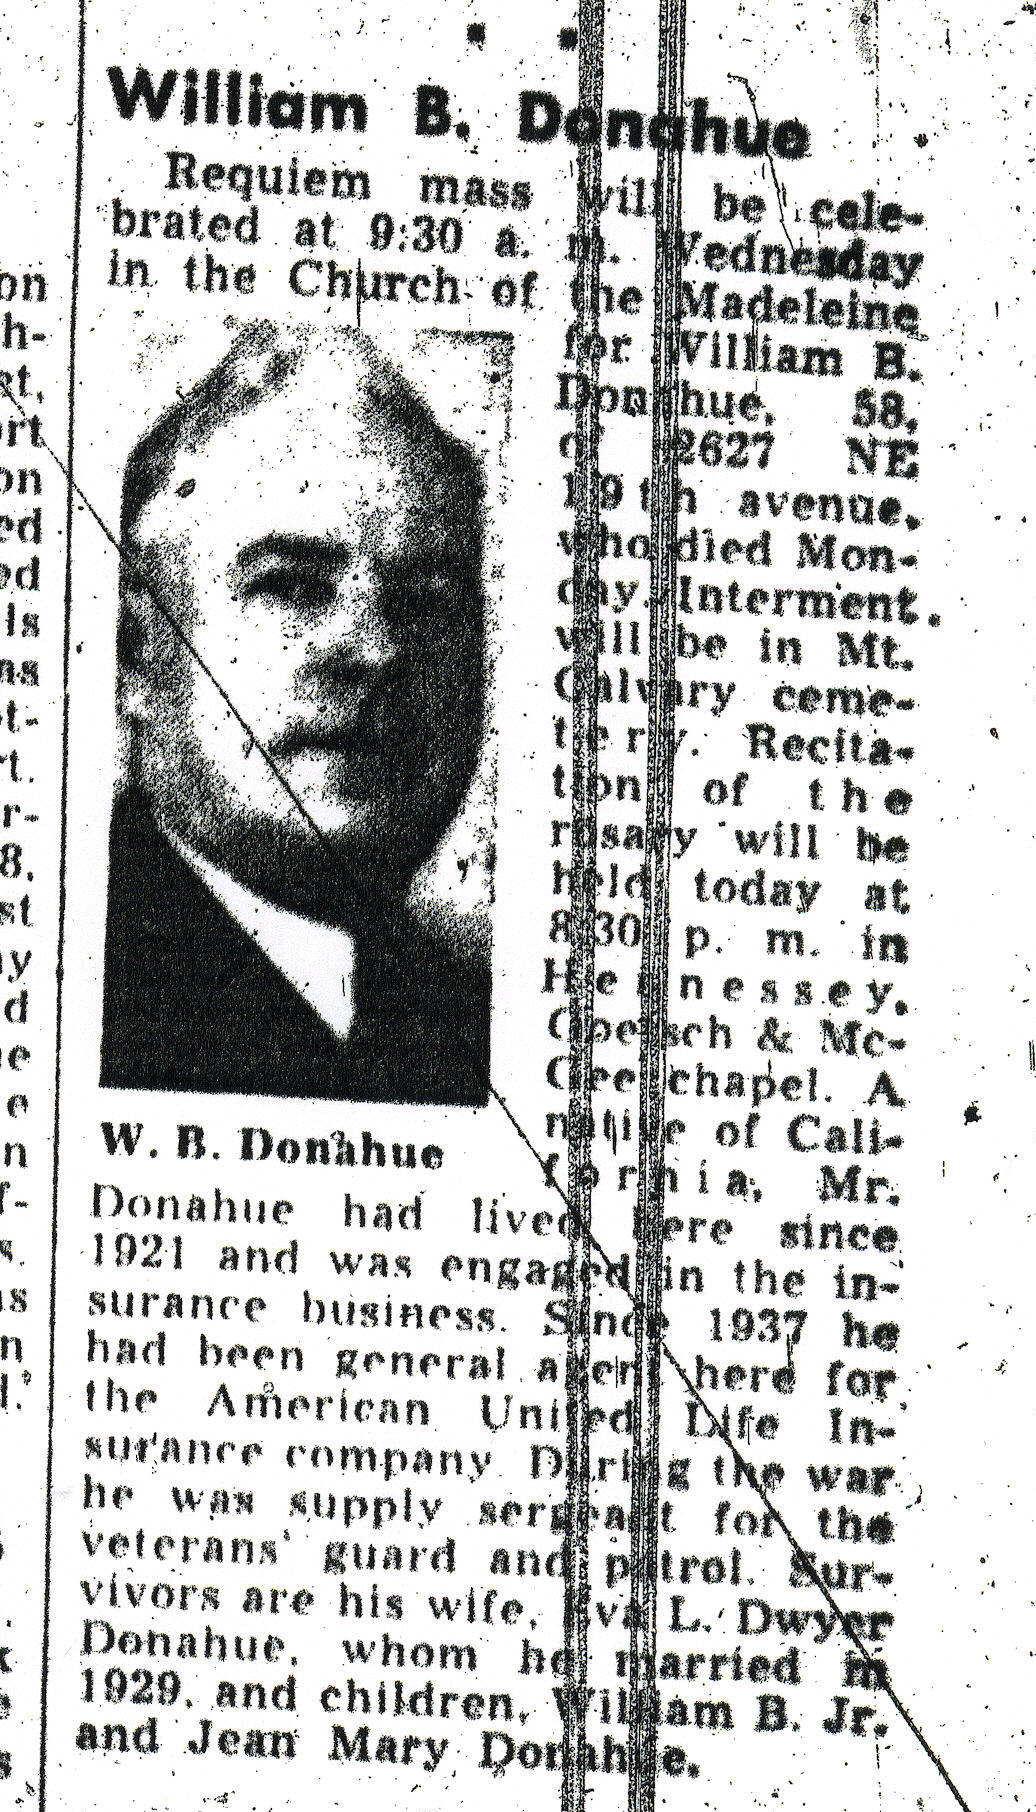 William Donahue Obituary